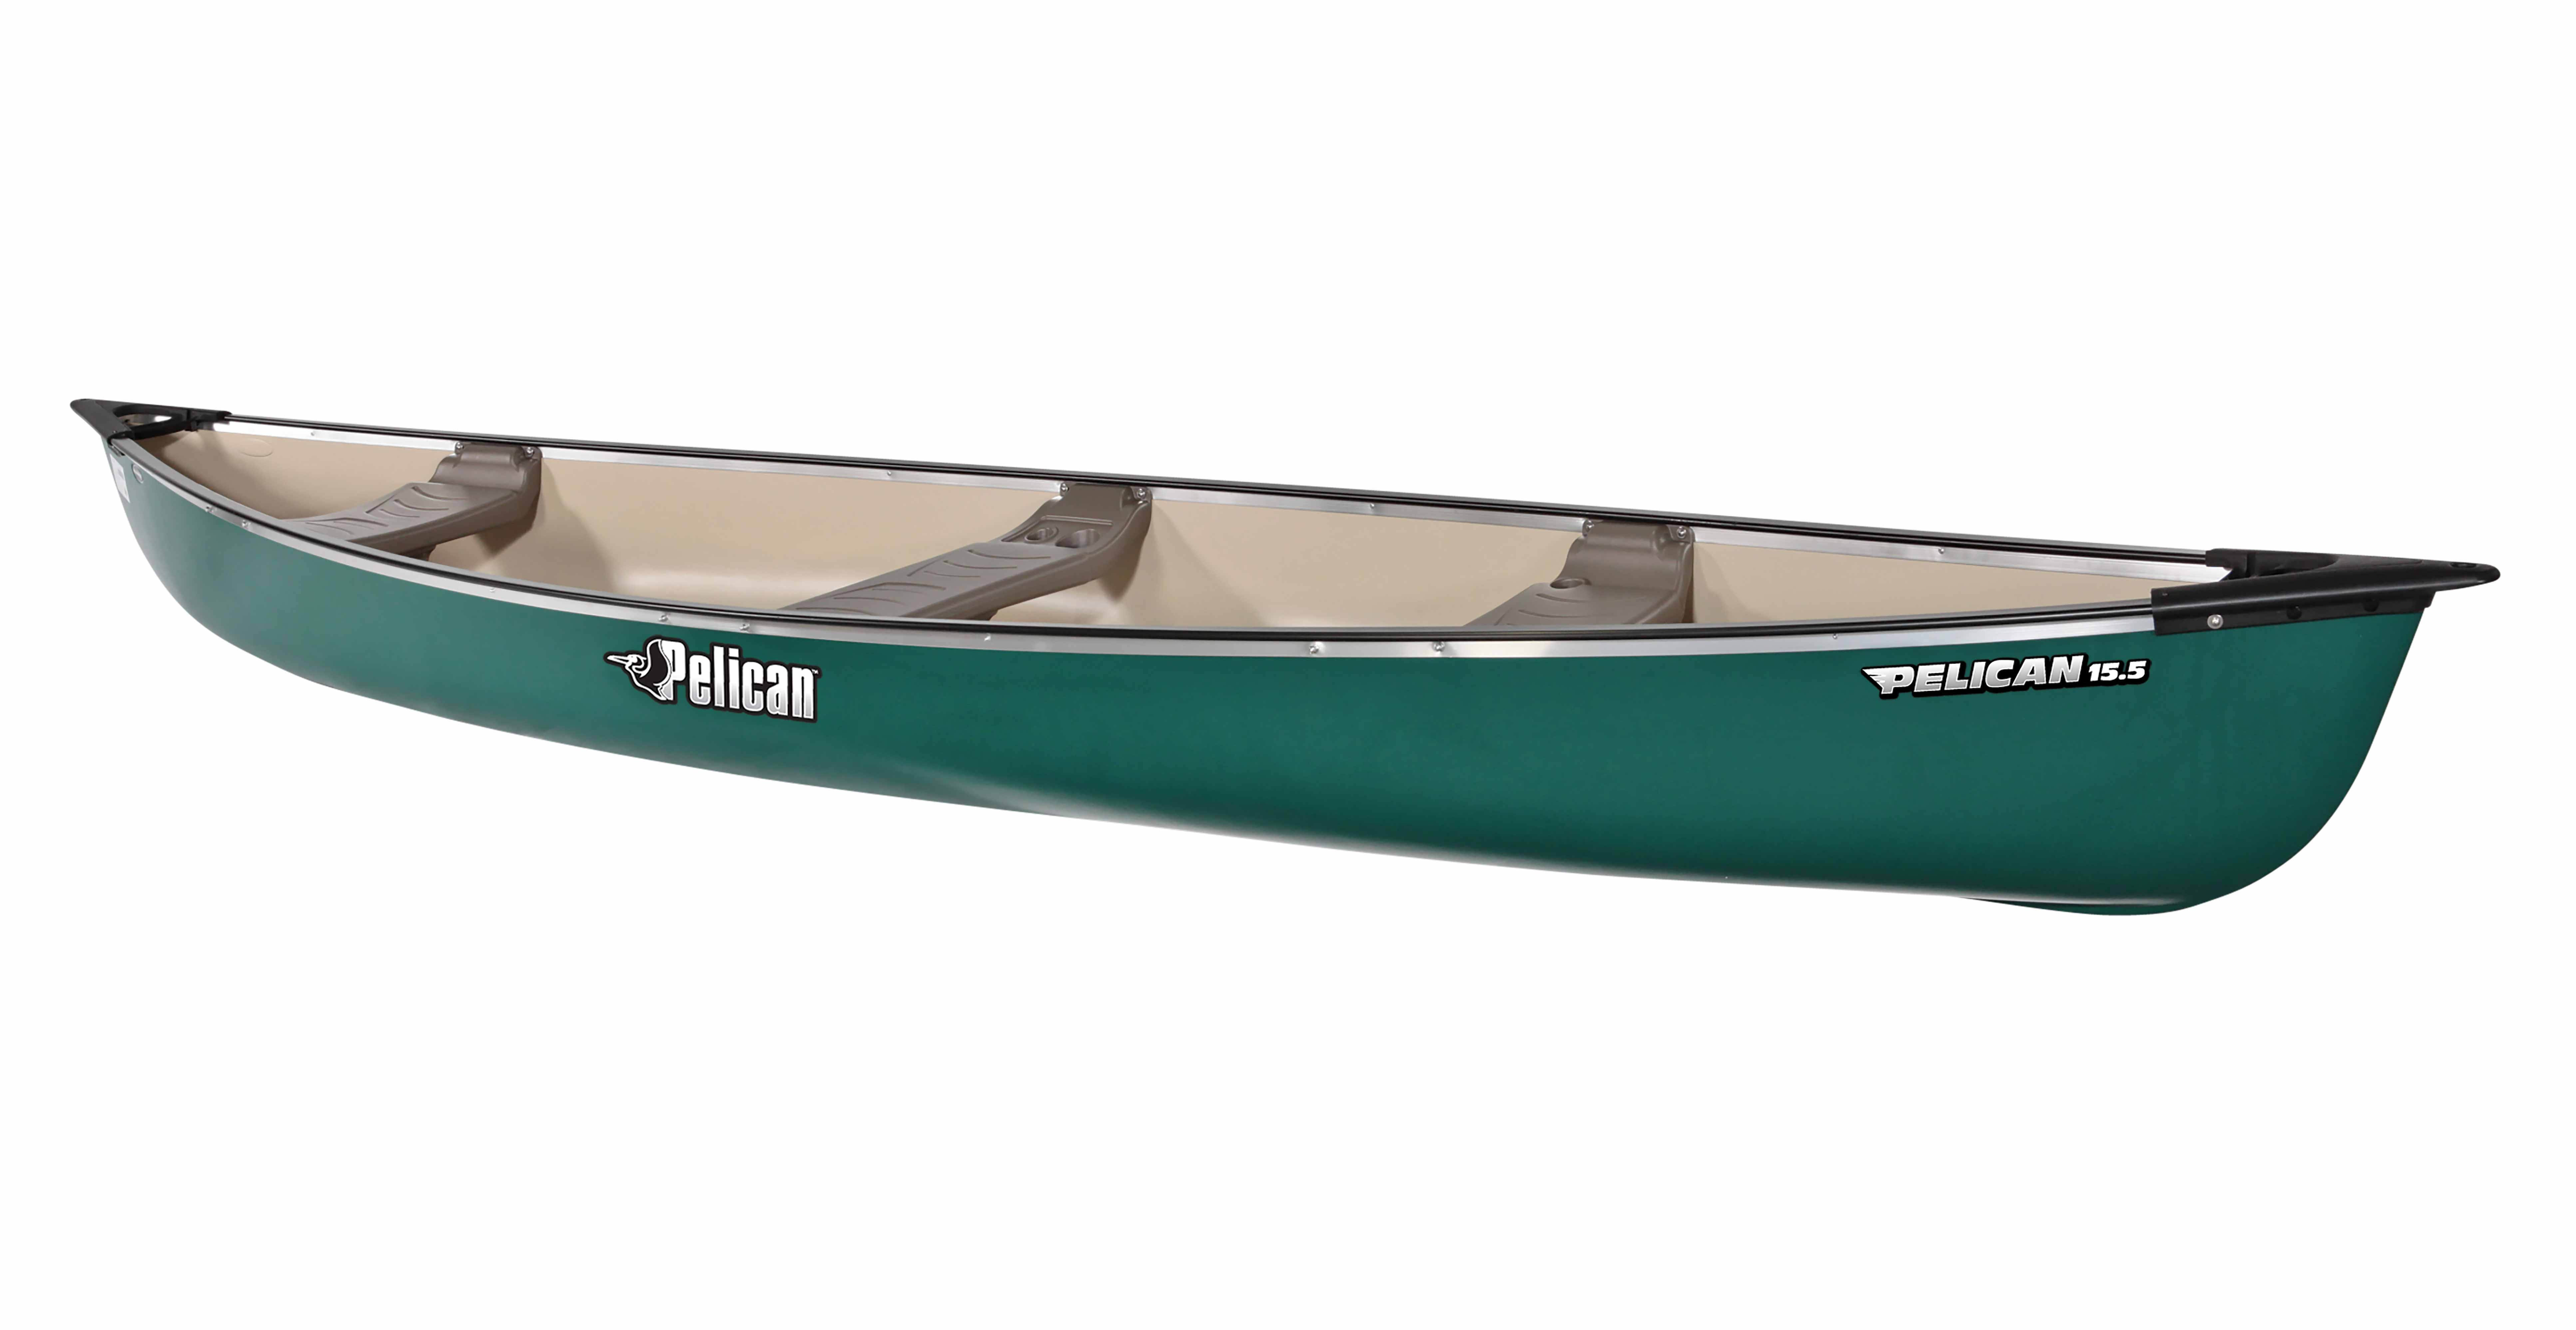 Canoes: Pelican 15.5 by Pelican - Image 4655